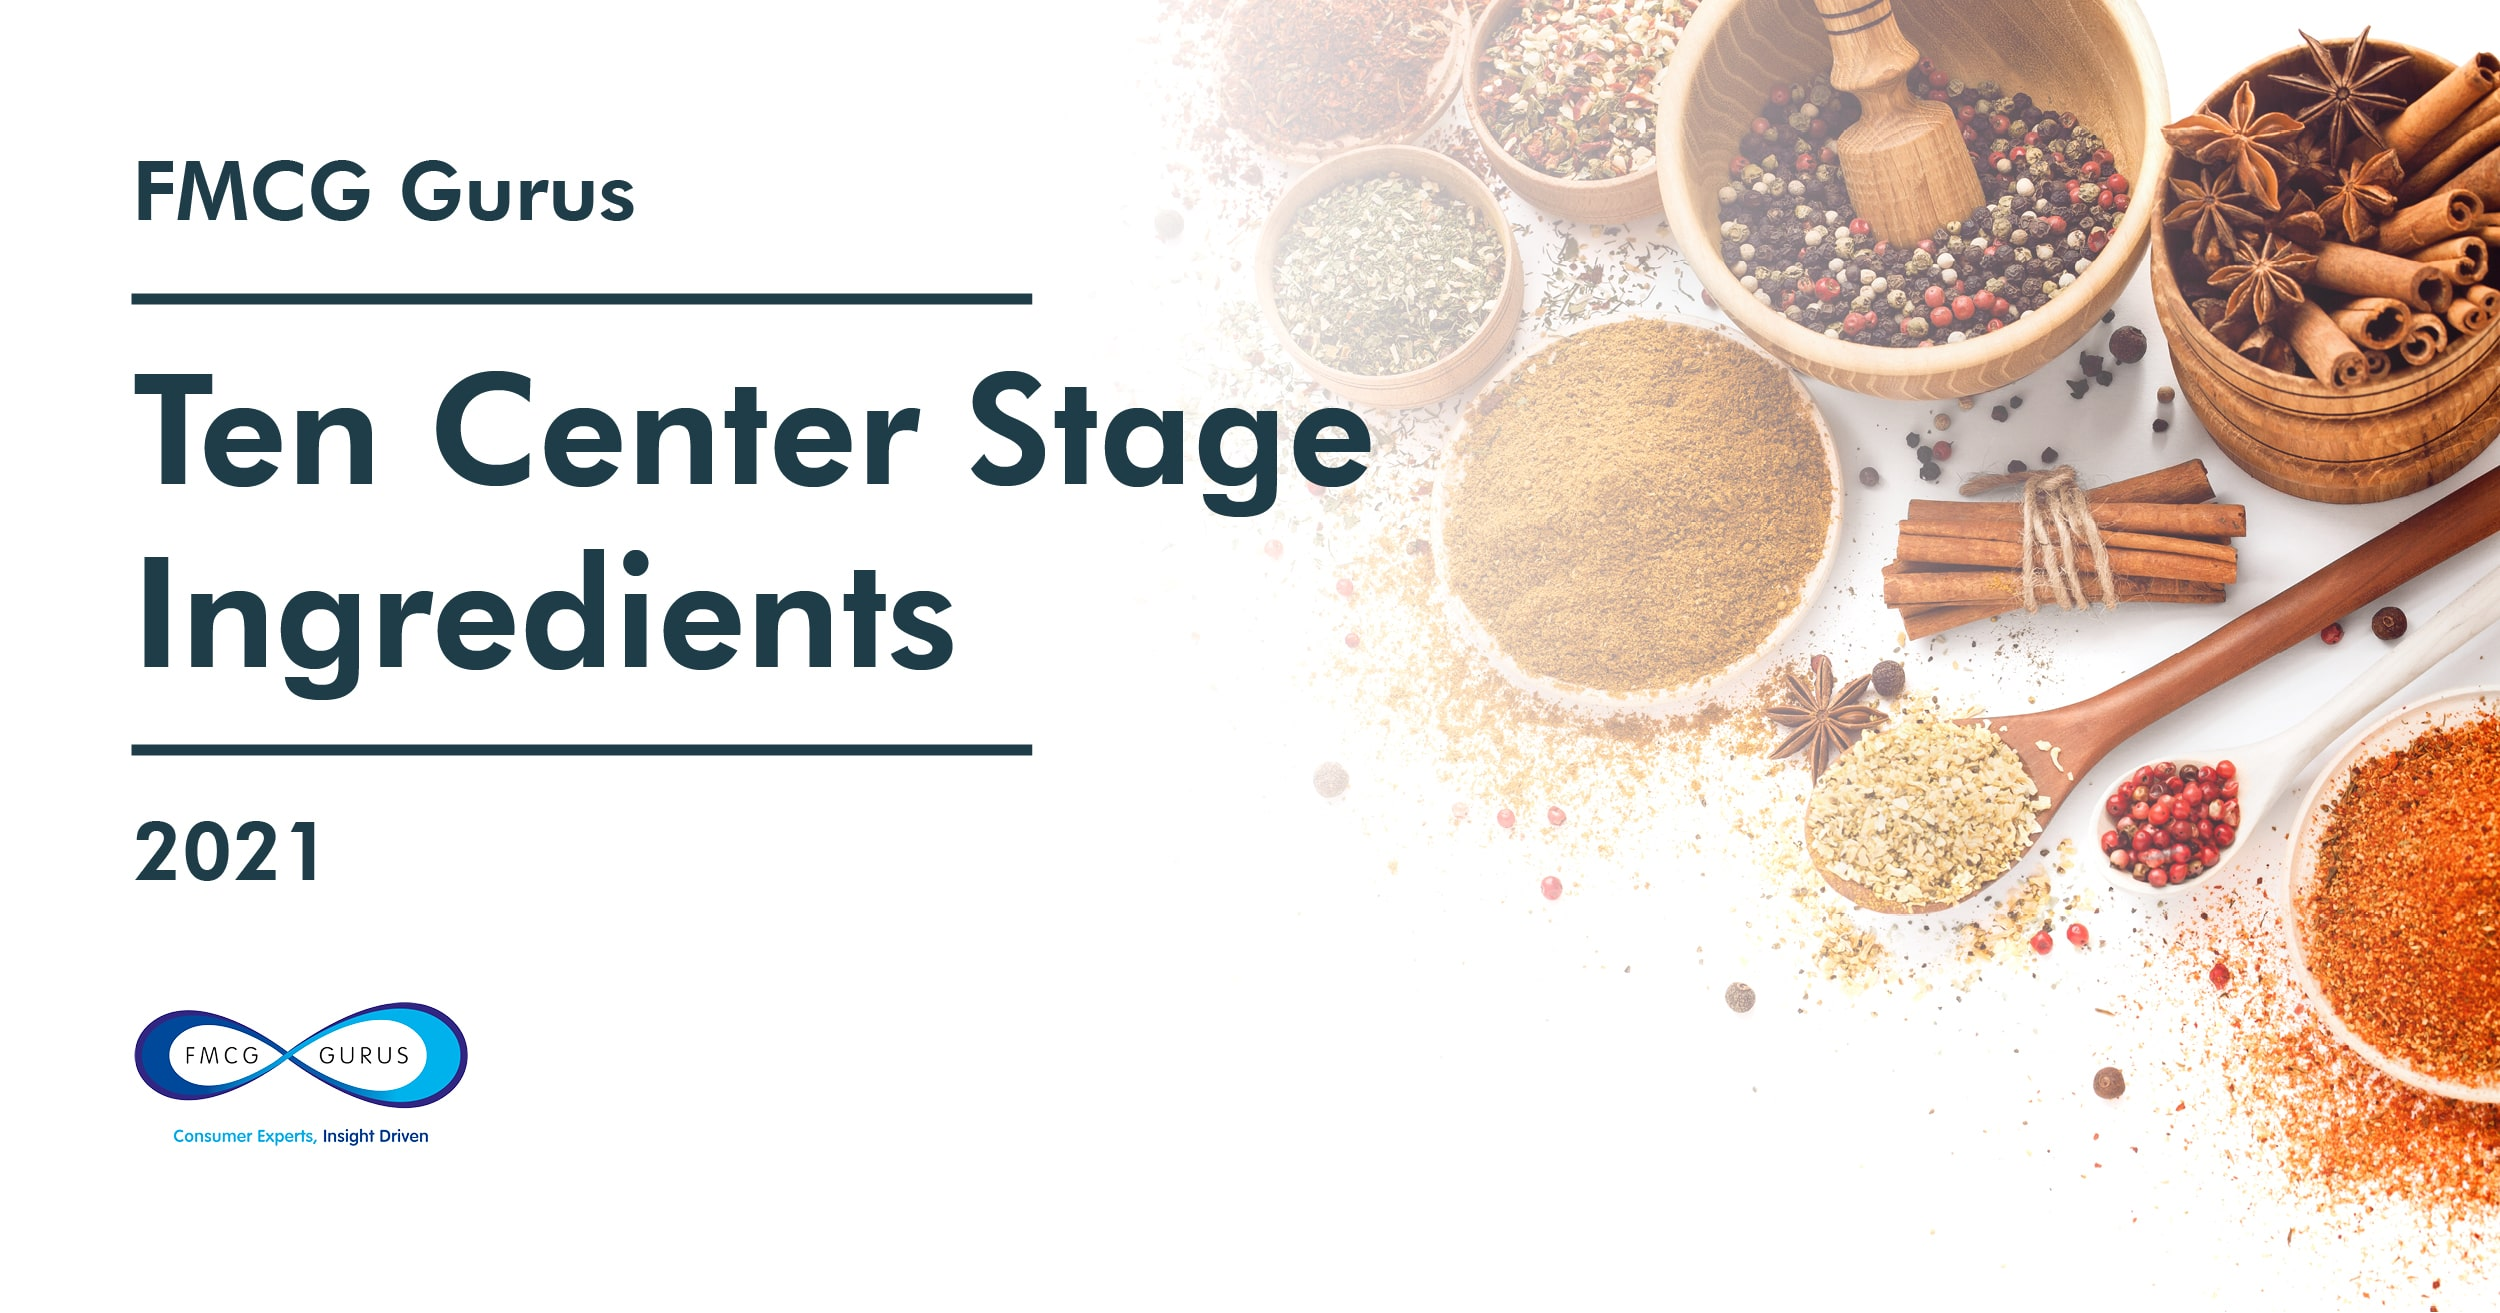 Ten Center Stage Ingredients in 2021.